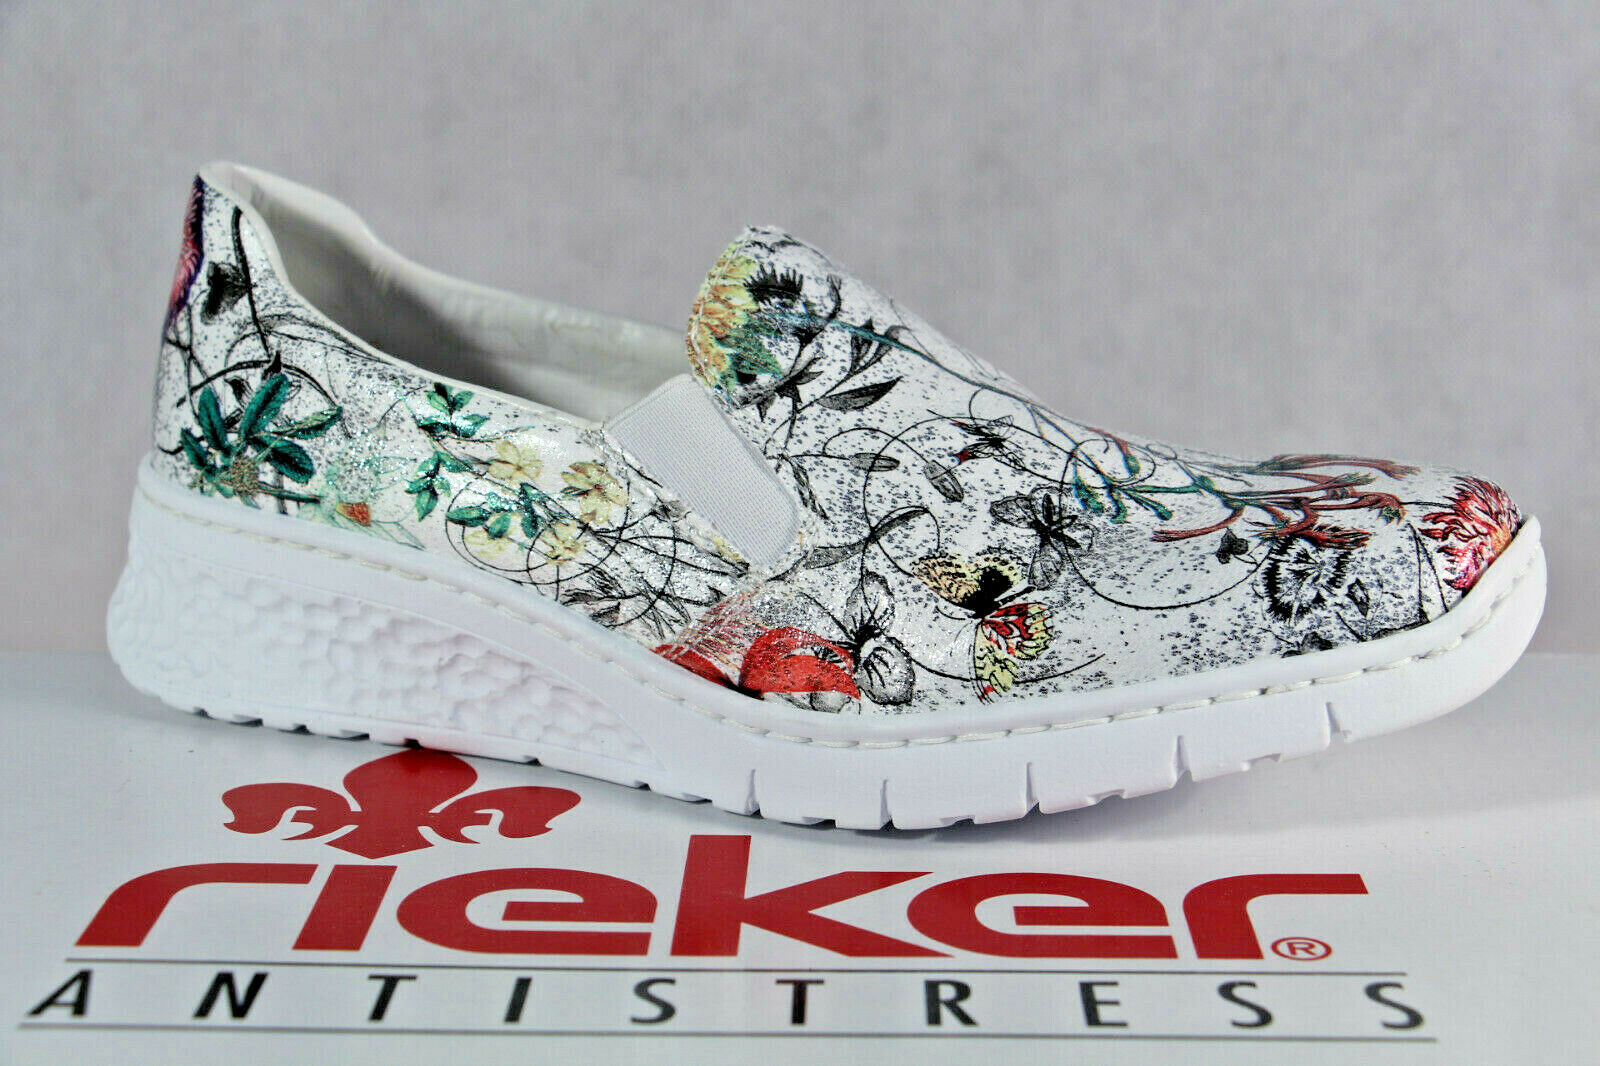 Rieker Pantofola Scarpe da Ginnastica Basse Ballerina MultiColoreeeeee 58166 Nuovo